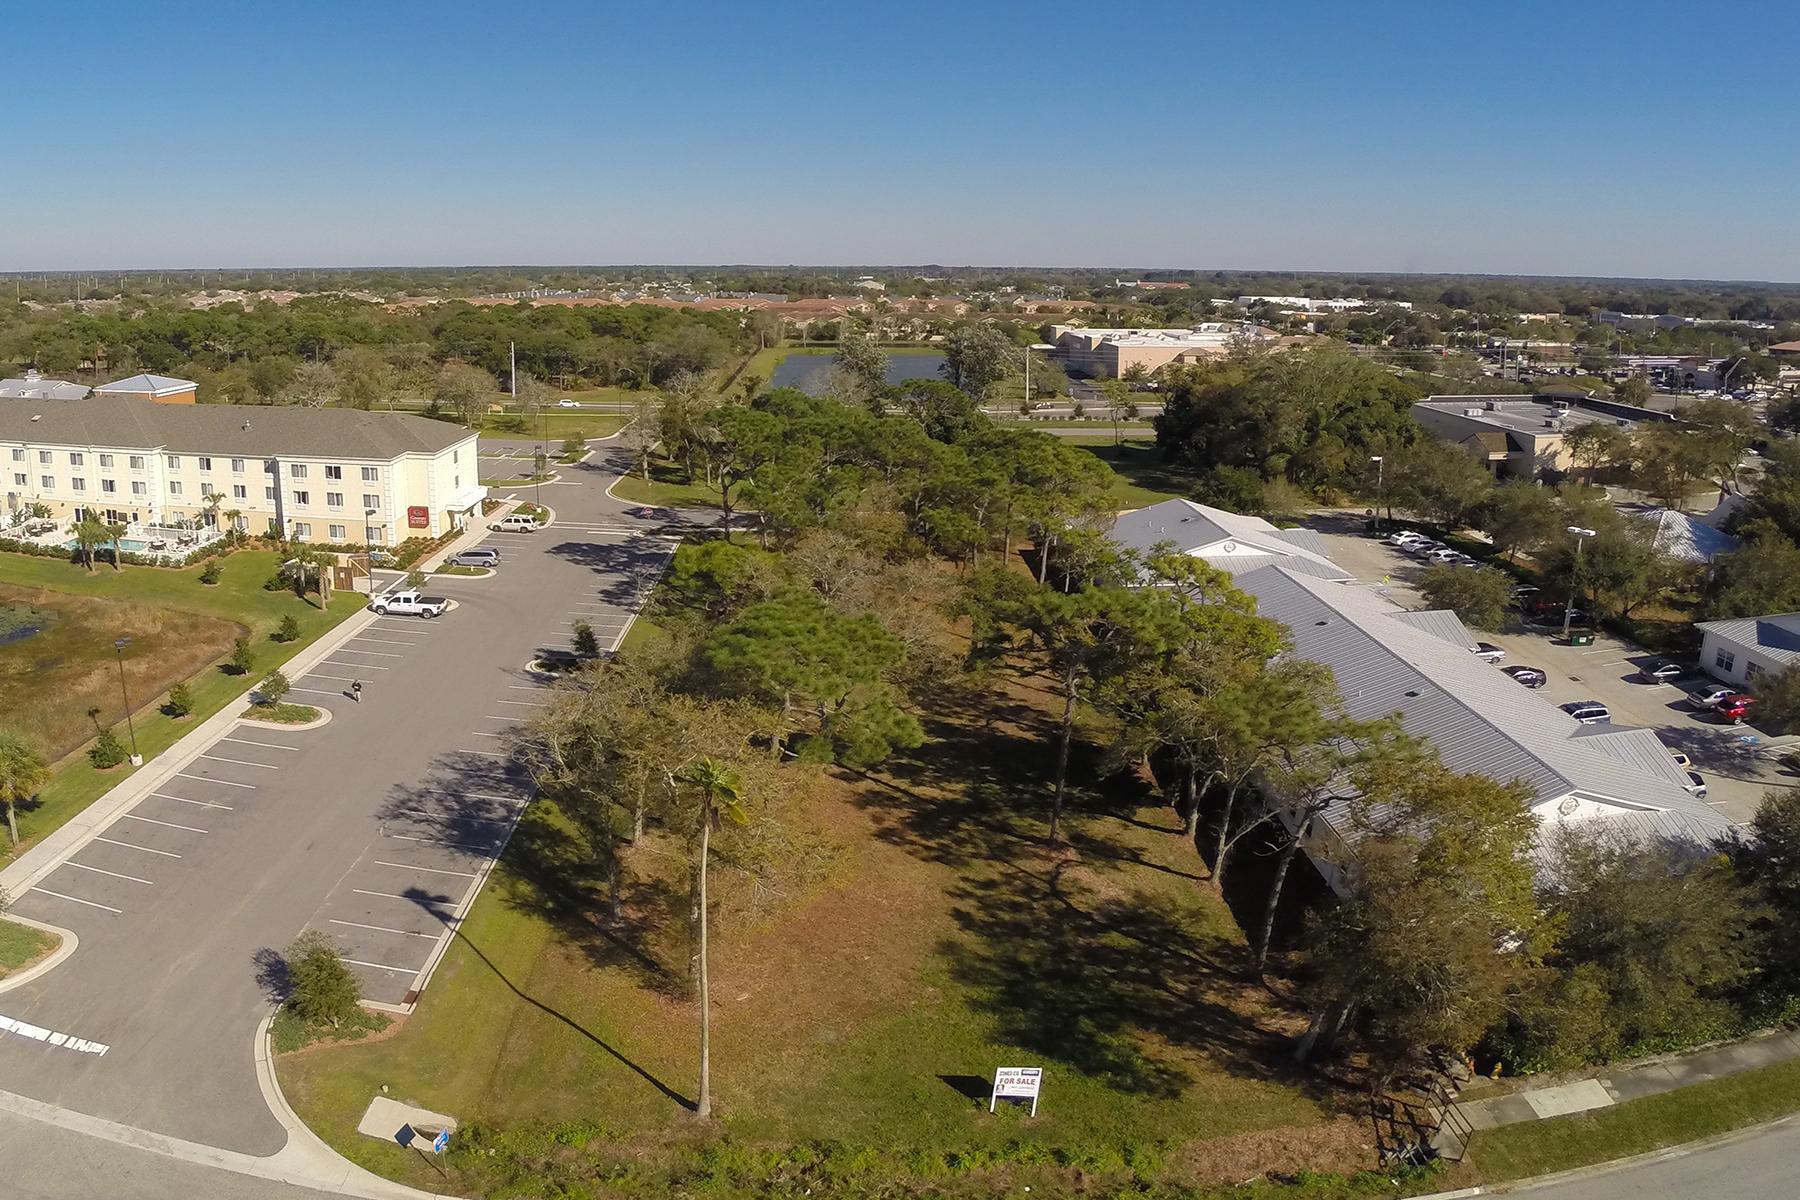 Commercial for Sale at RIDGECREST 5706 Mead Ave, Sarasota, Florida 34233 United States